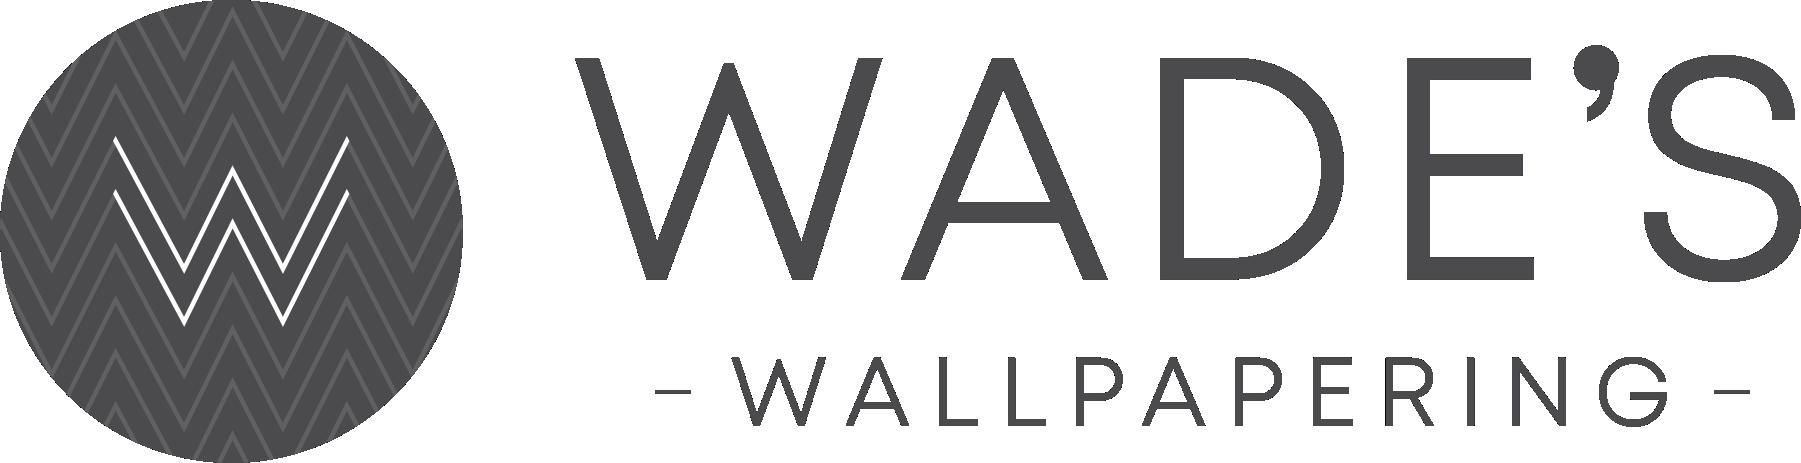 Wade's Wallpapering